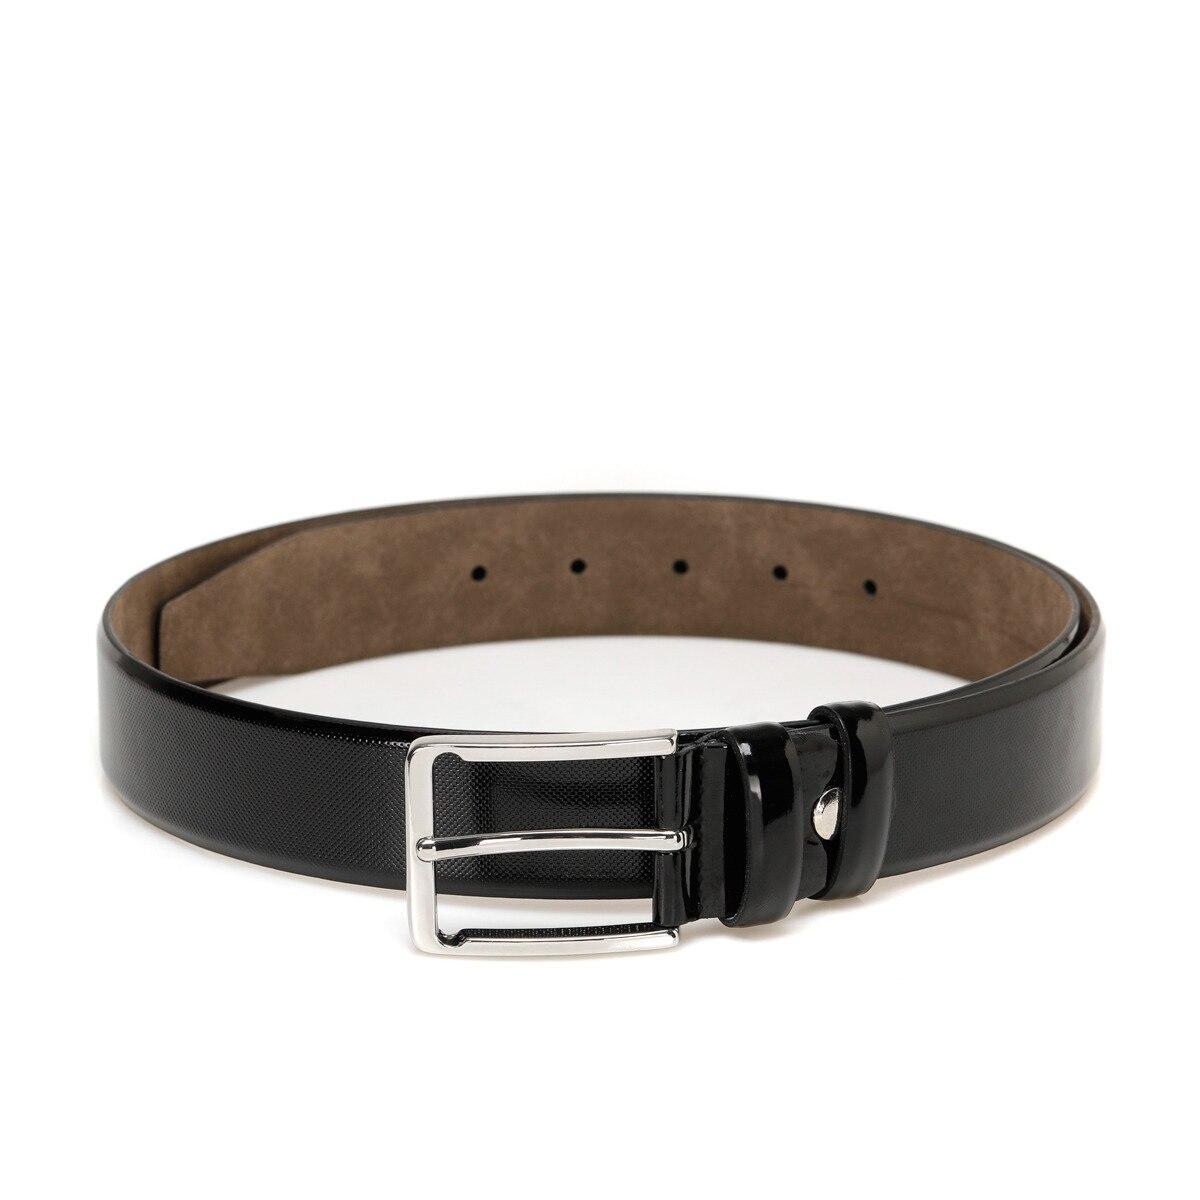 FLO 20M BR RGN IGNE Black Male Belt Garamond